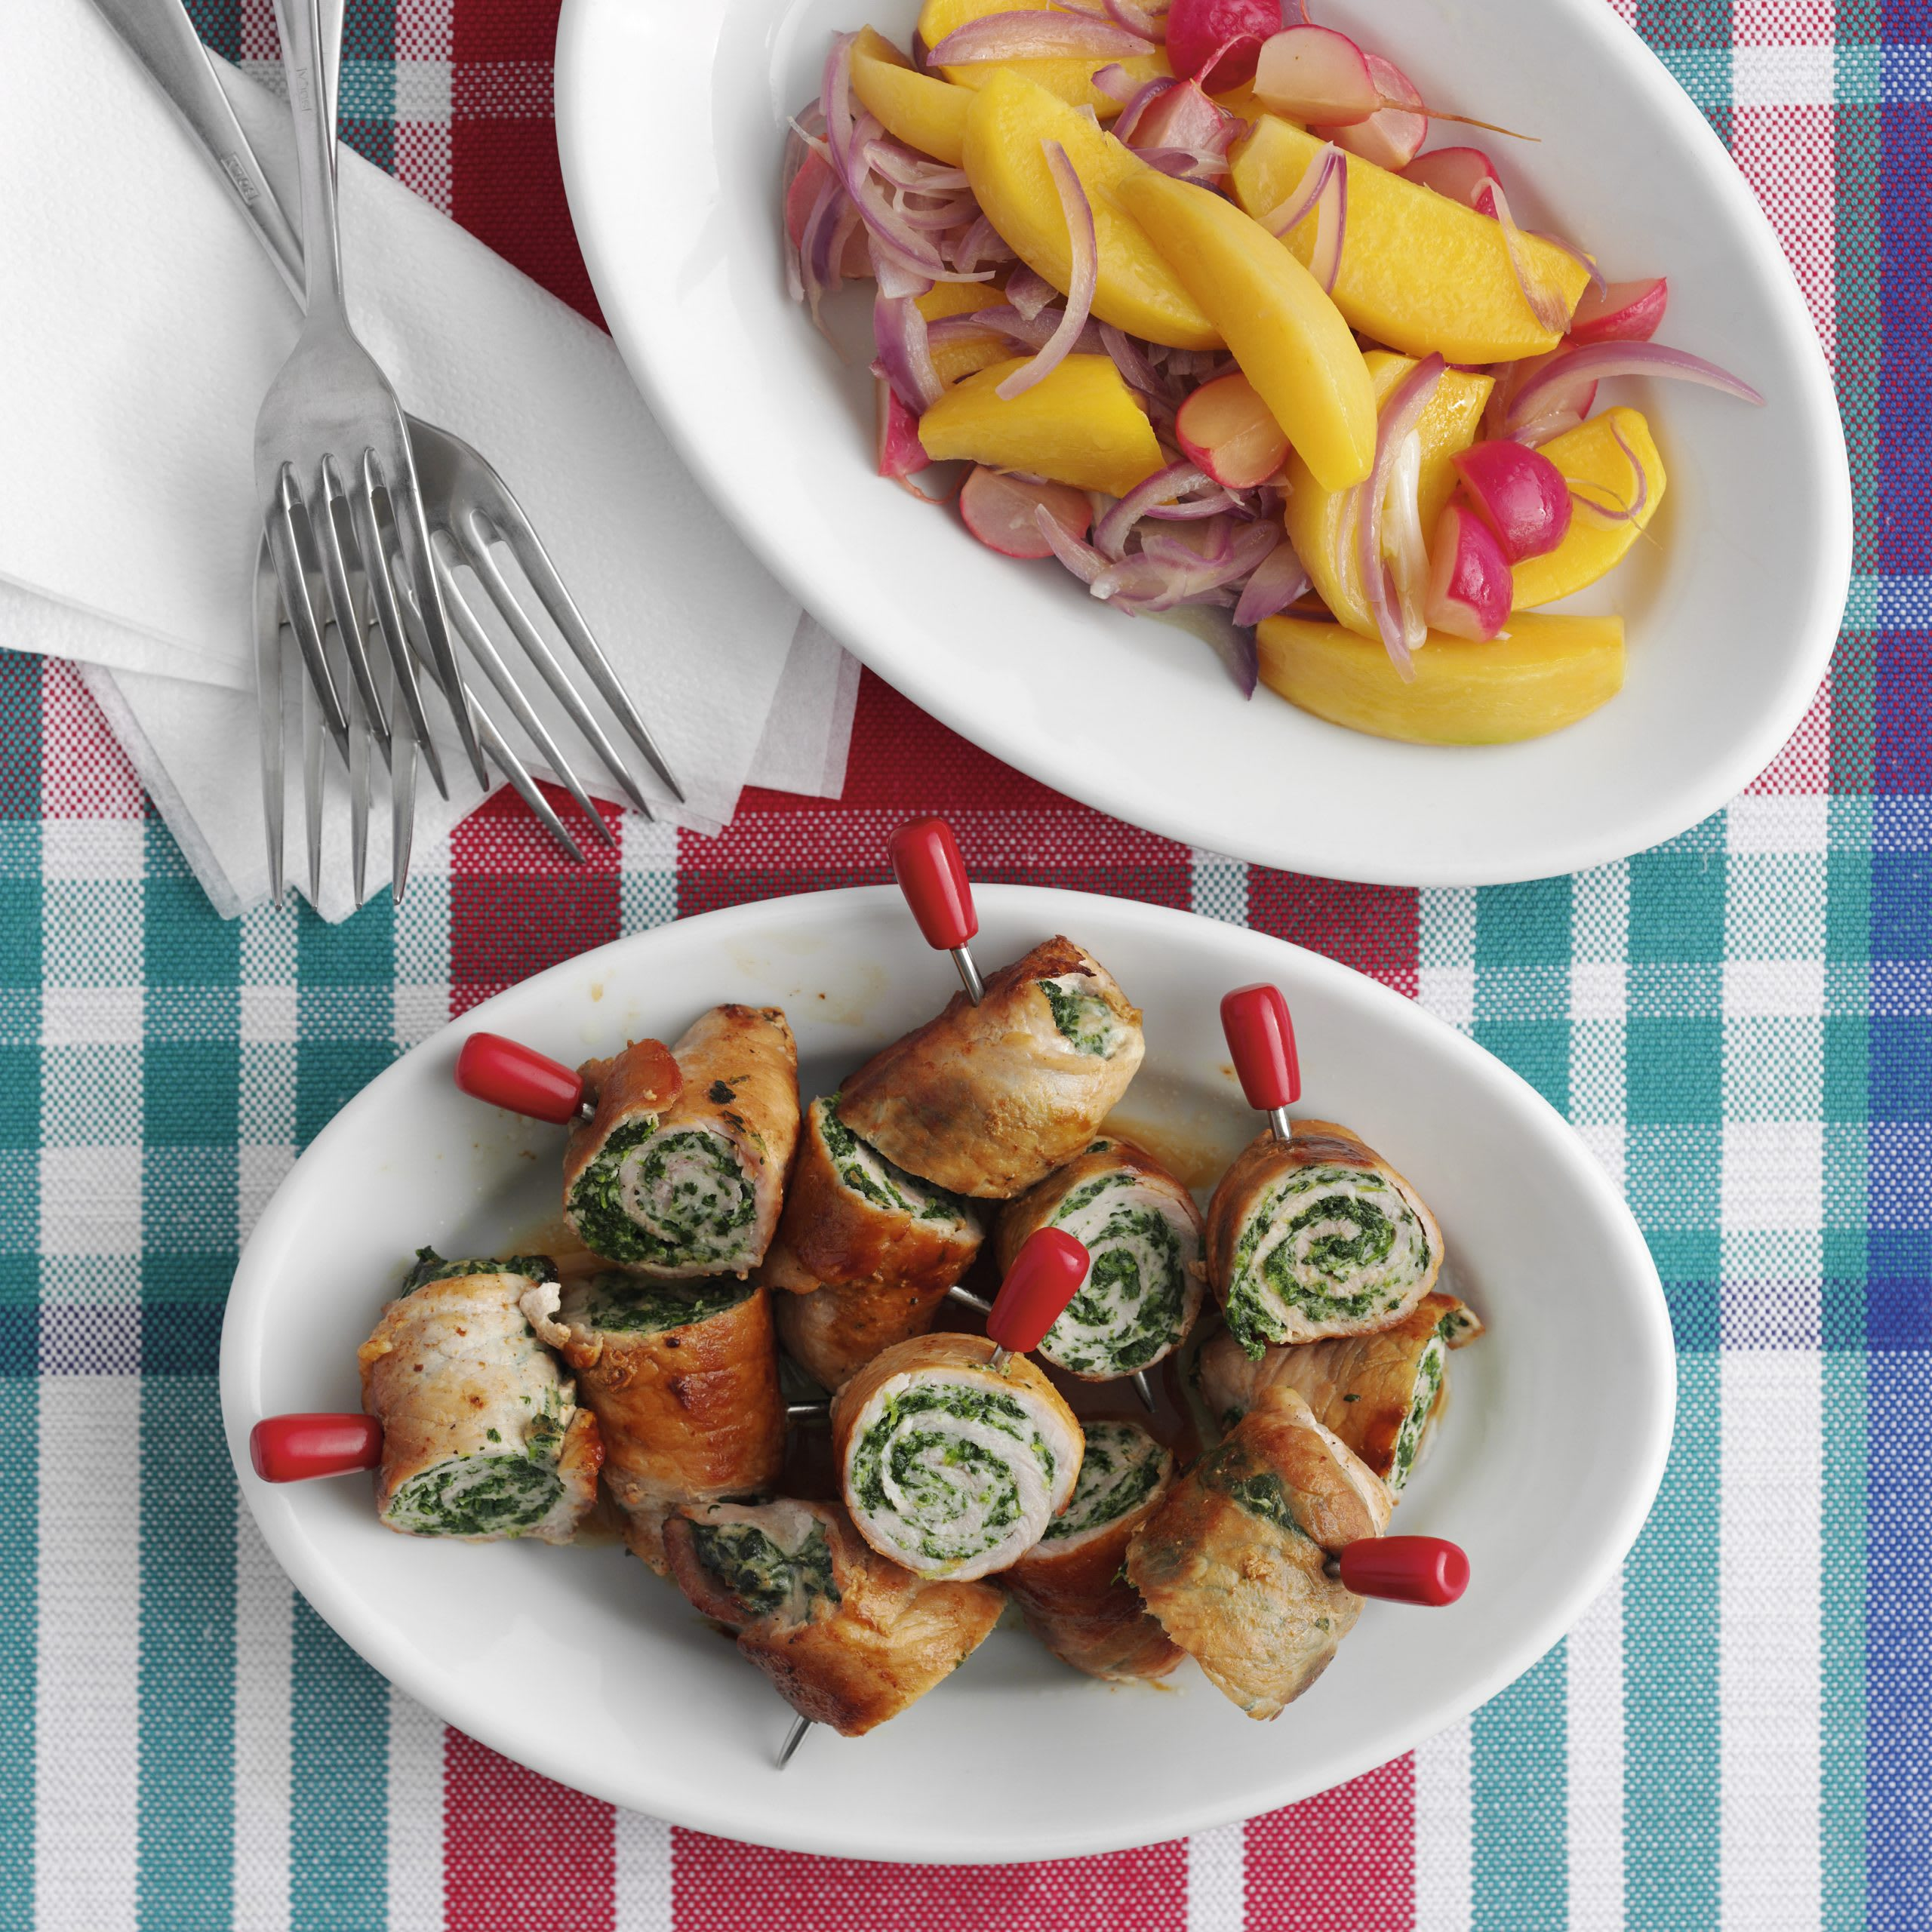 Brochettes viande-épinards et rutabagas